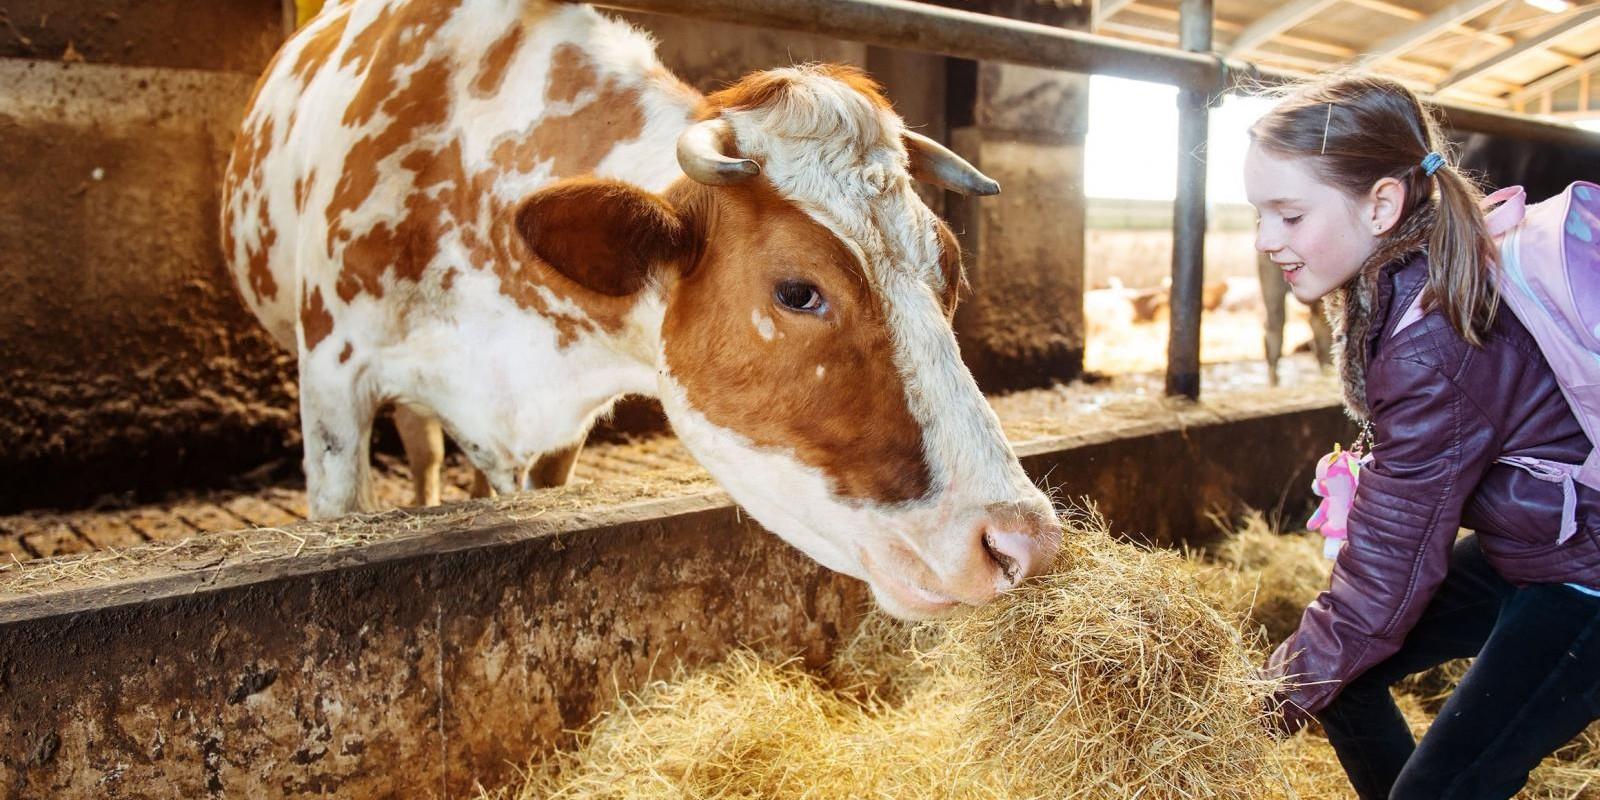 Igualdade Para Os Animais: Especismo E Sofrimento Animal Sob A Perspectiva Utilitarista Singeriana